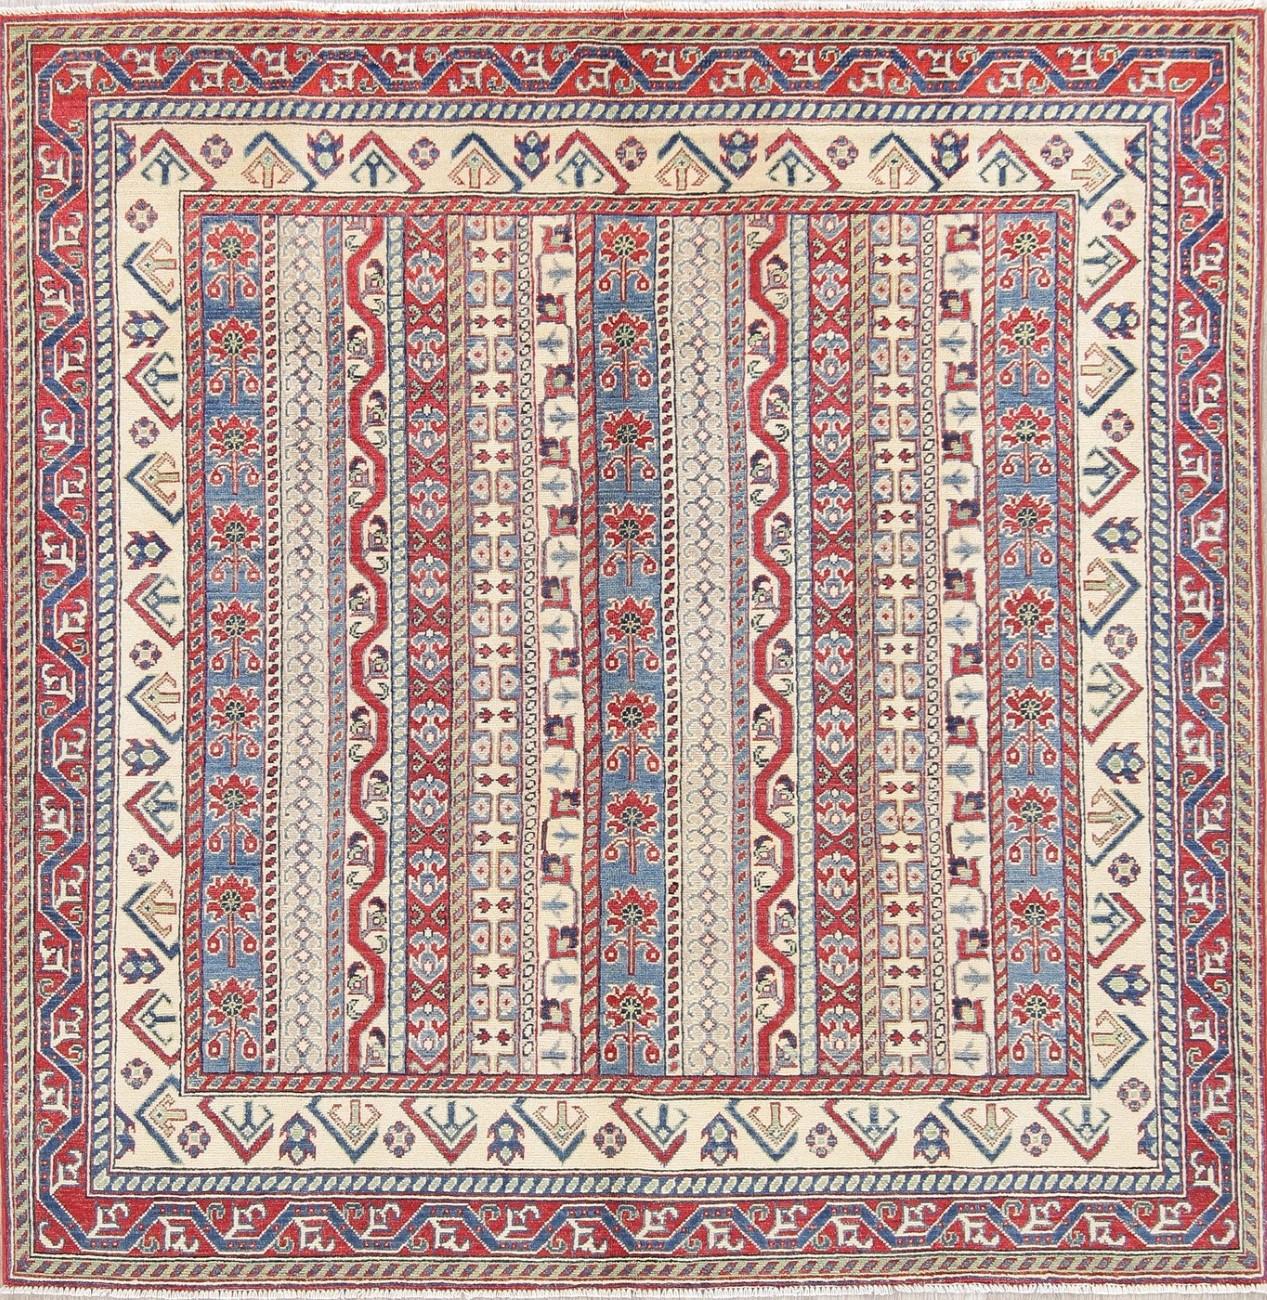 Breathtaking Large Geometric Red 10x12 Bakhtiari Persian: New Chechen-Kazak Hand-Knotted Geometric Square Rug 7x7